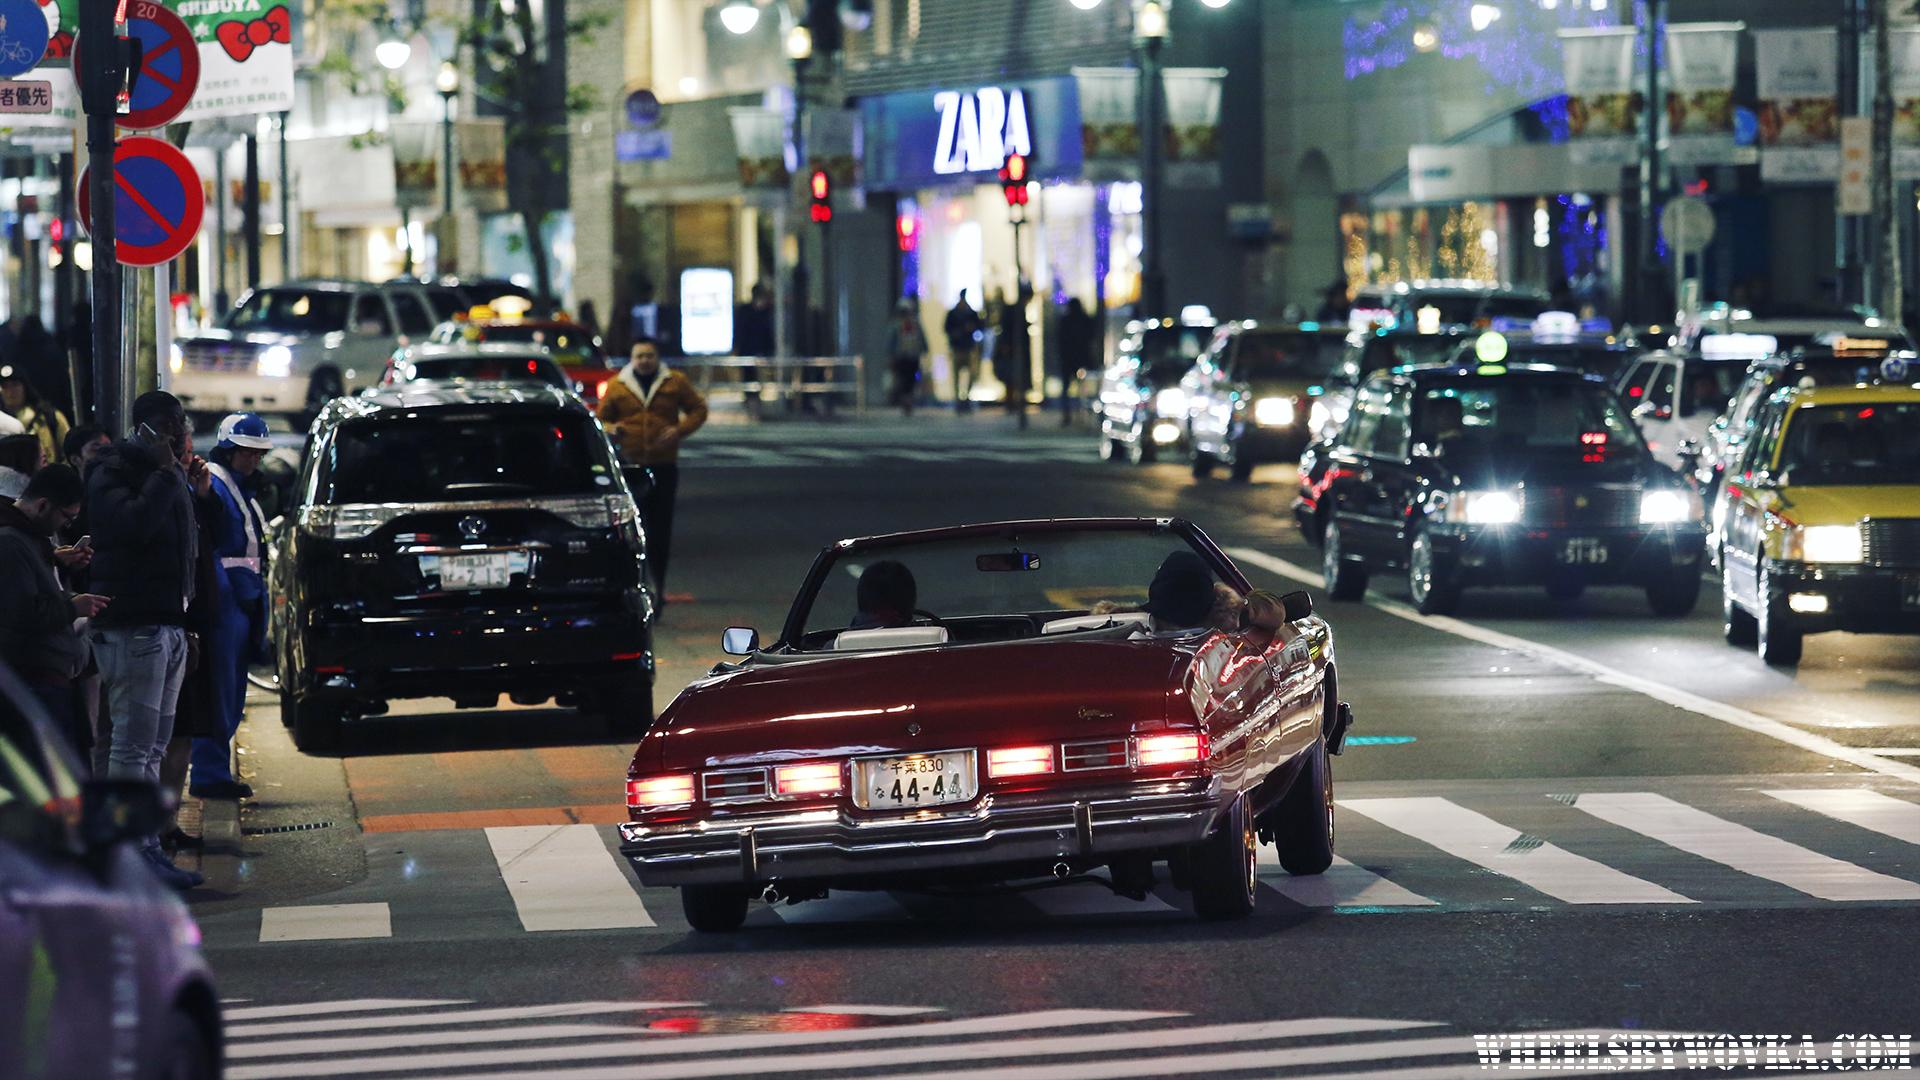 shibuya-japan-tokyo-lowrider-cruise-night-6